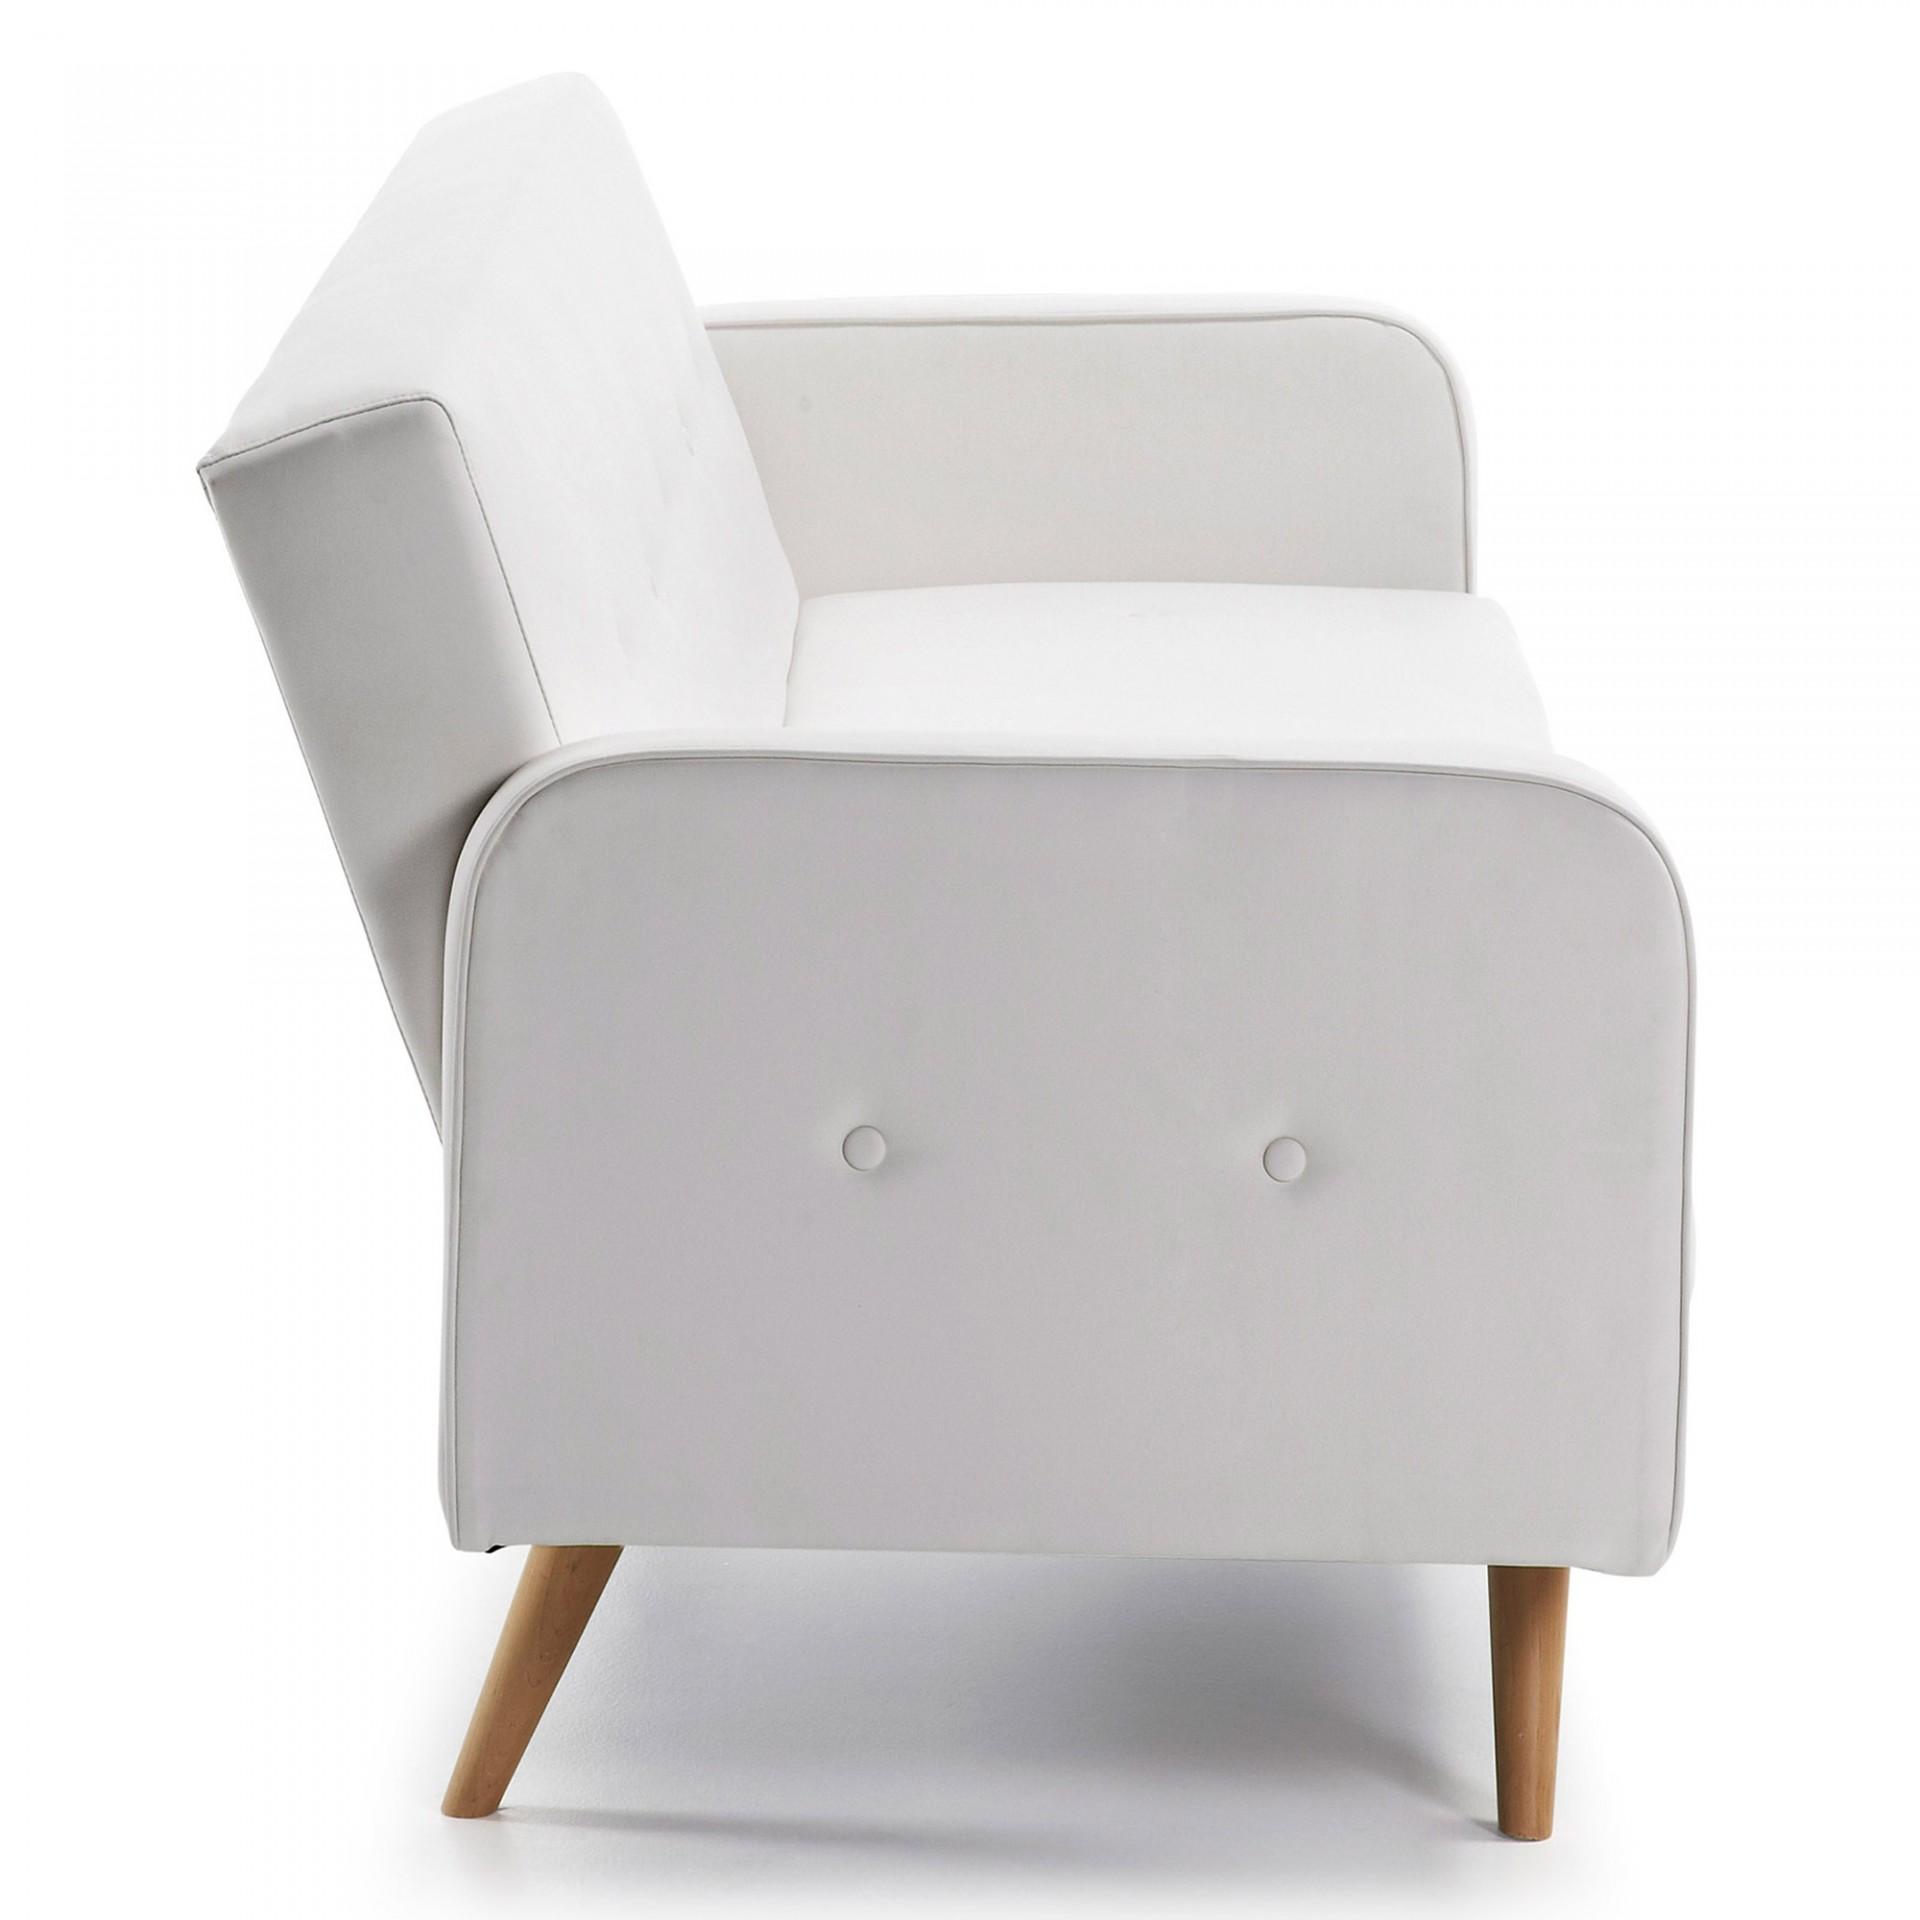 Sofá-cama Rogui, 3x lugares, pele sintética, branco